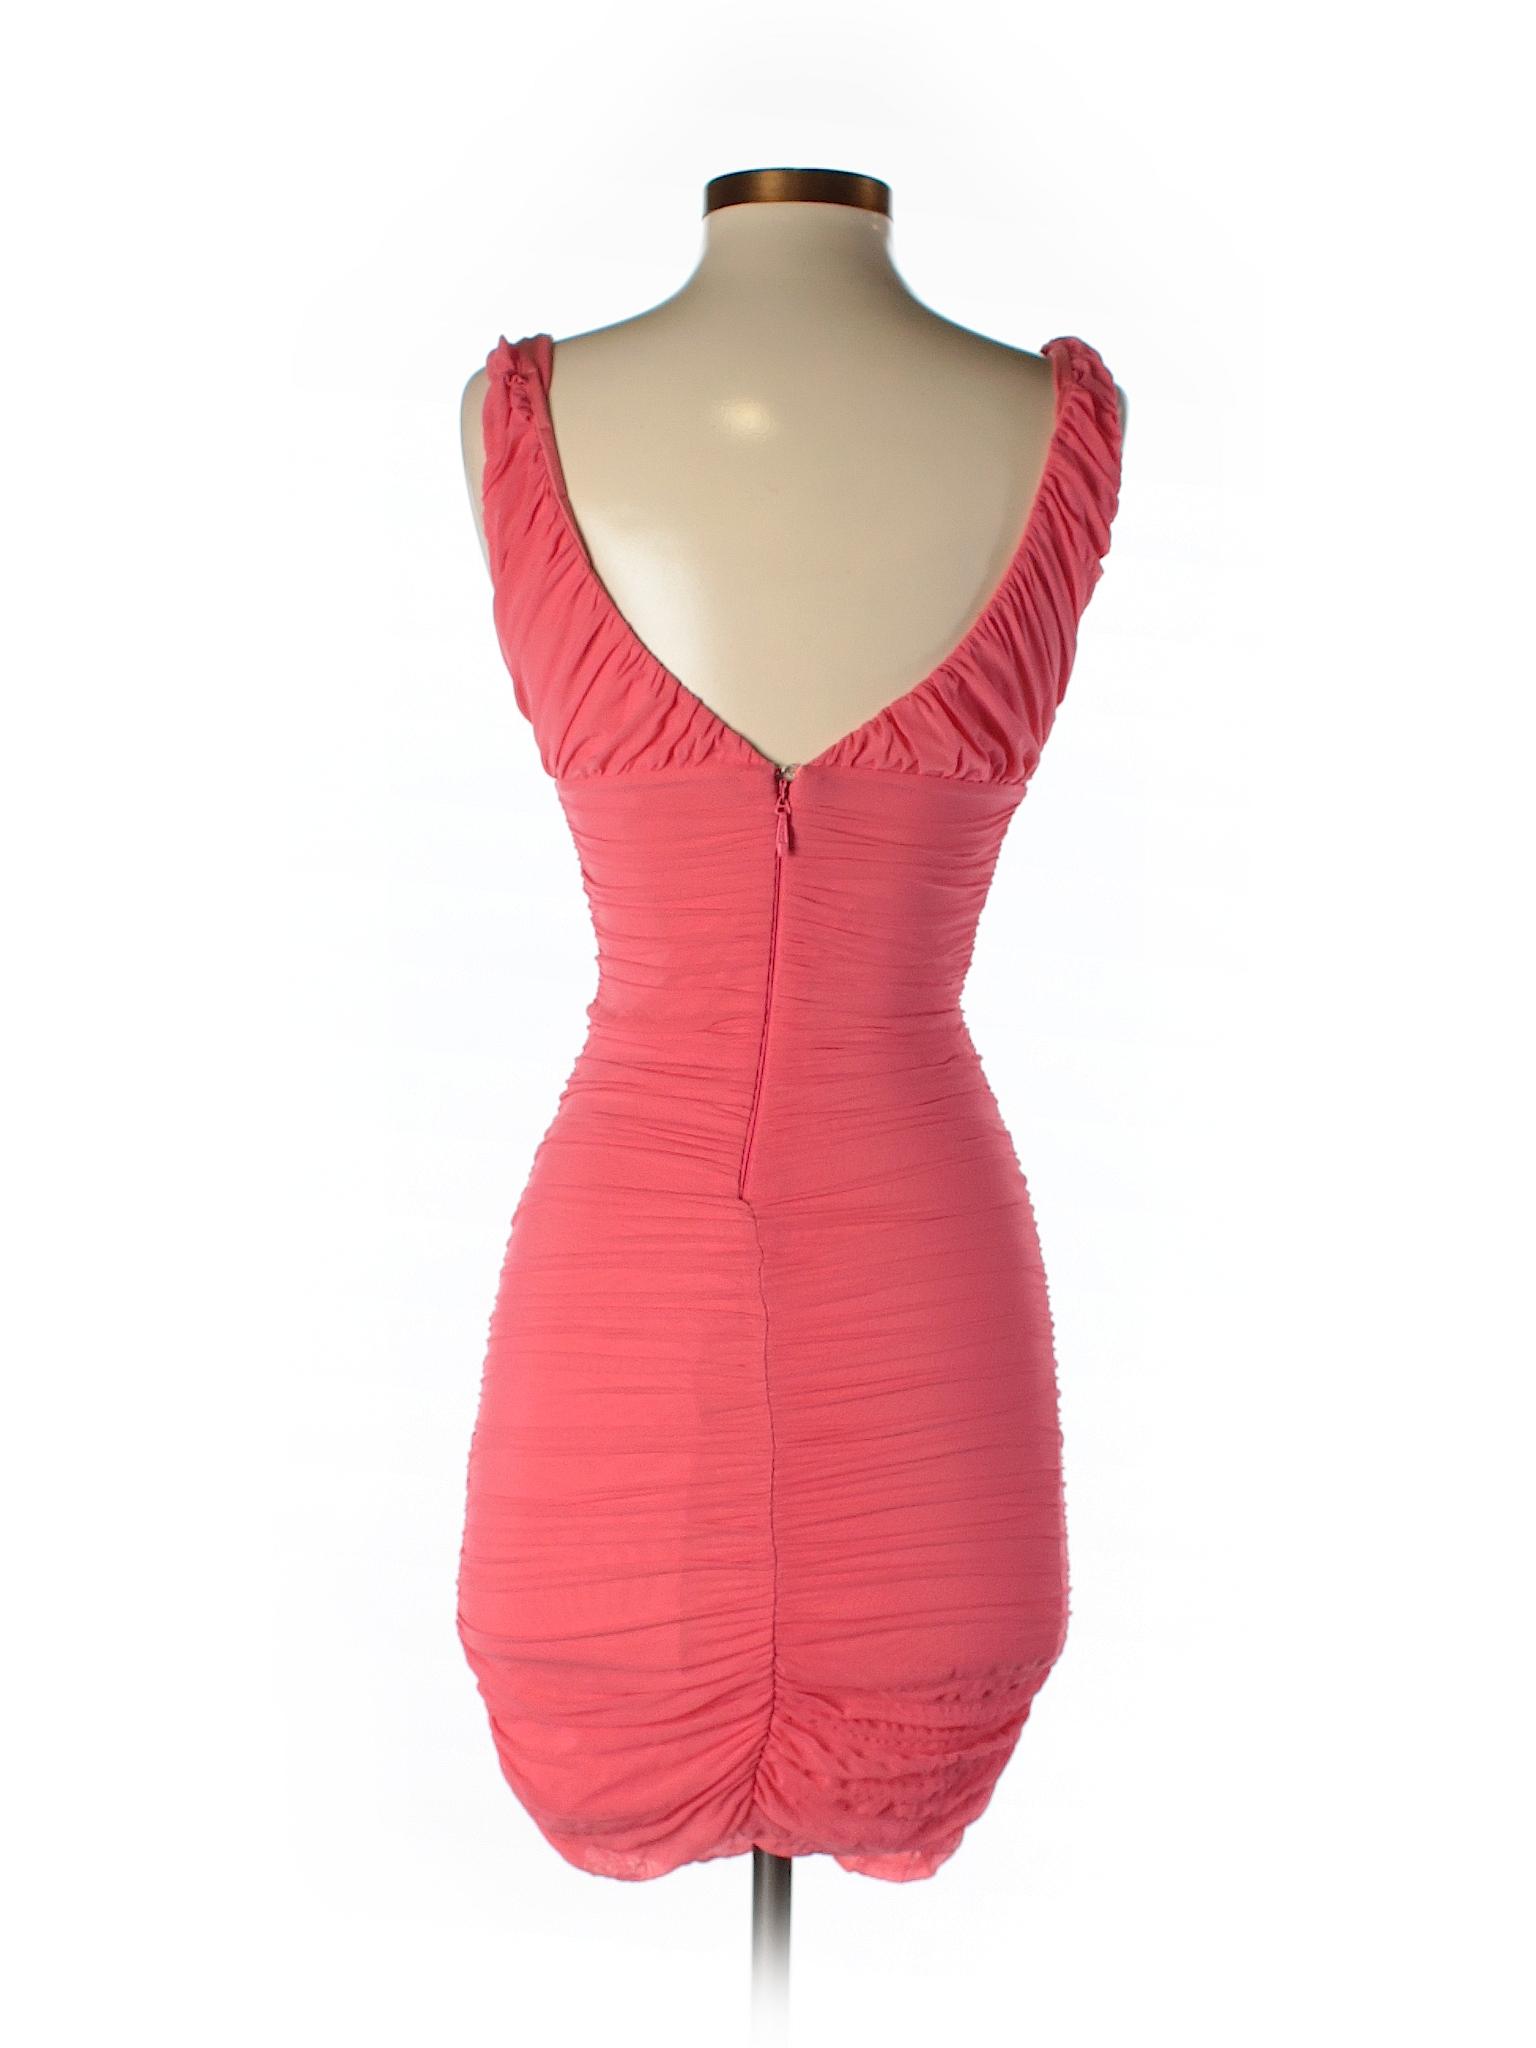 Dress Bebe Selling Bebe Cocktail Selling dw4Irq4